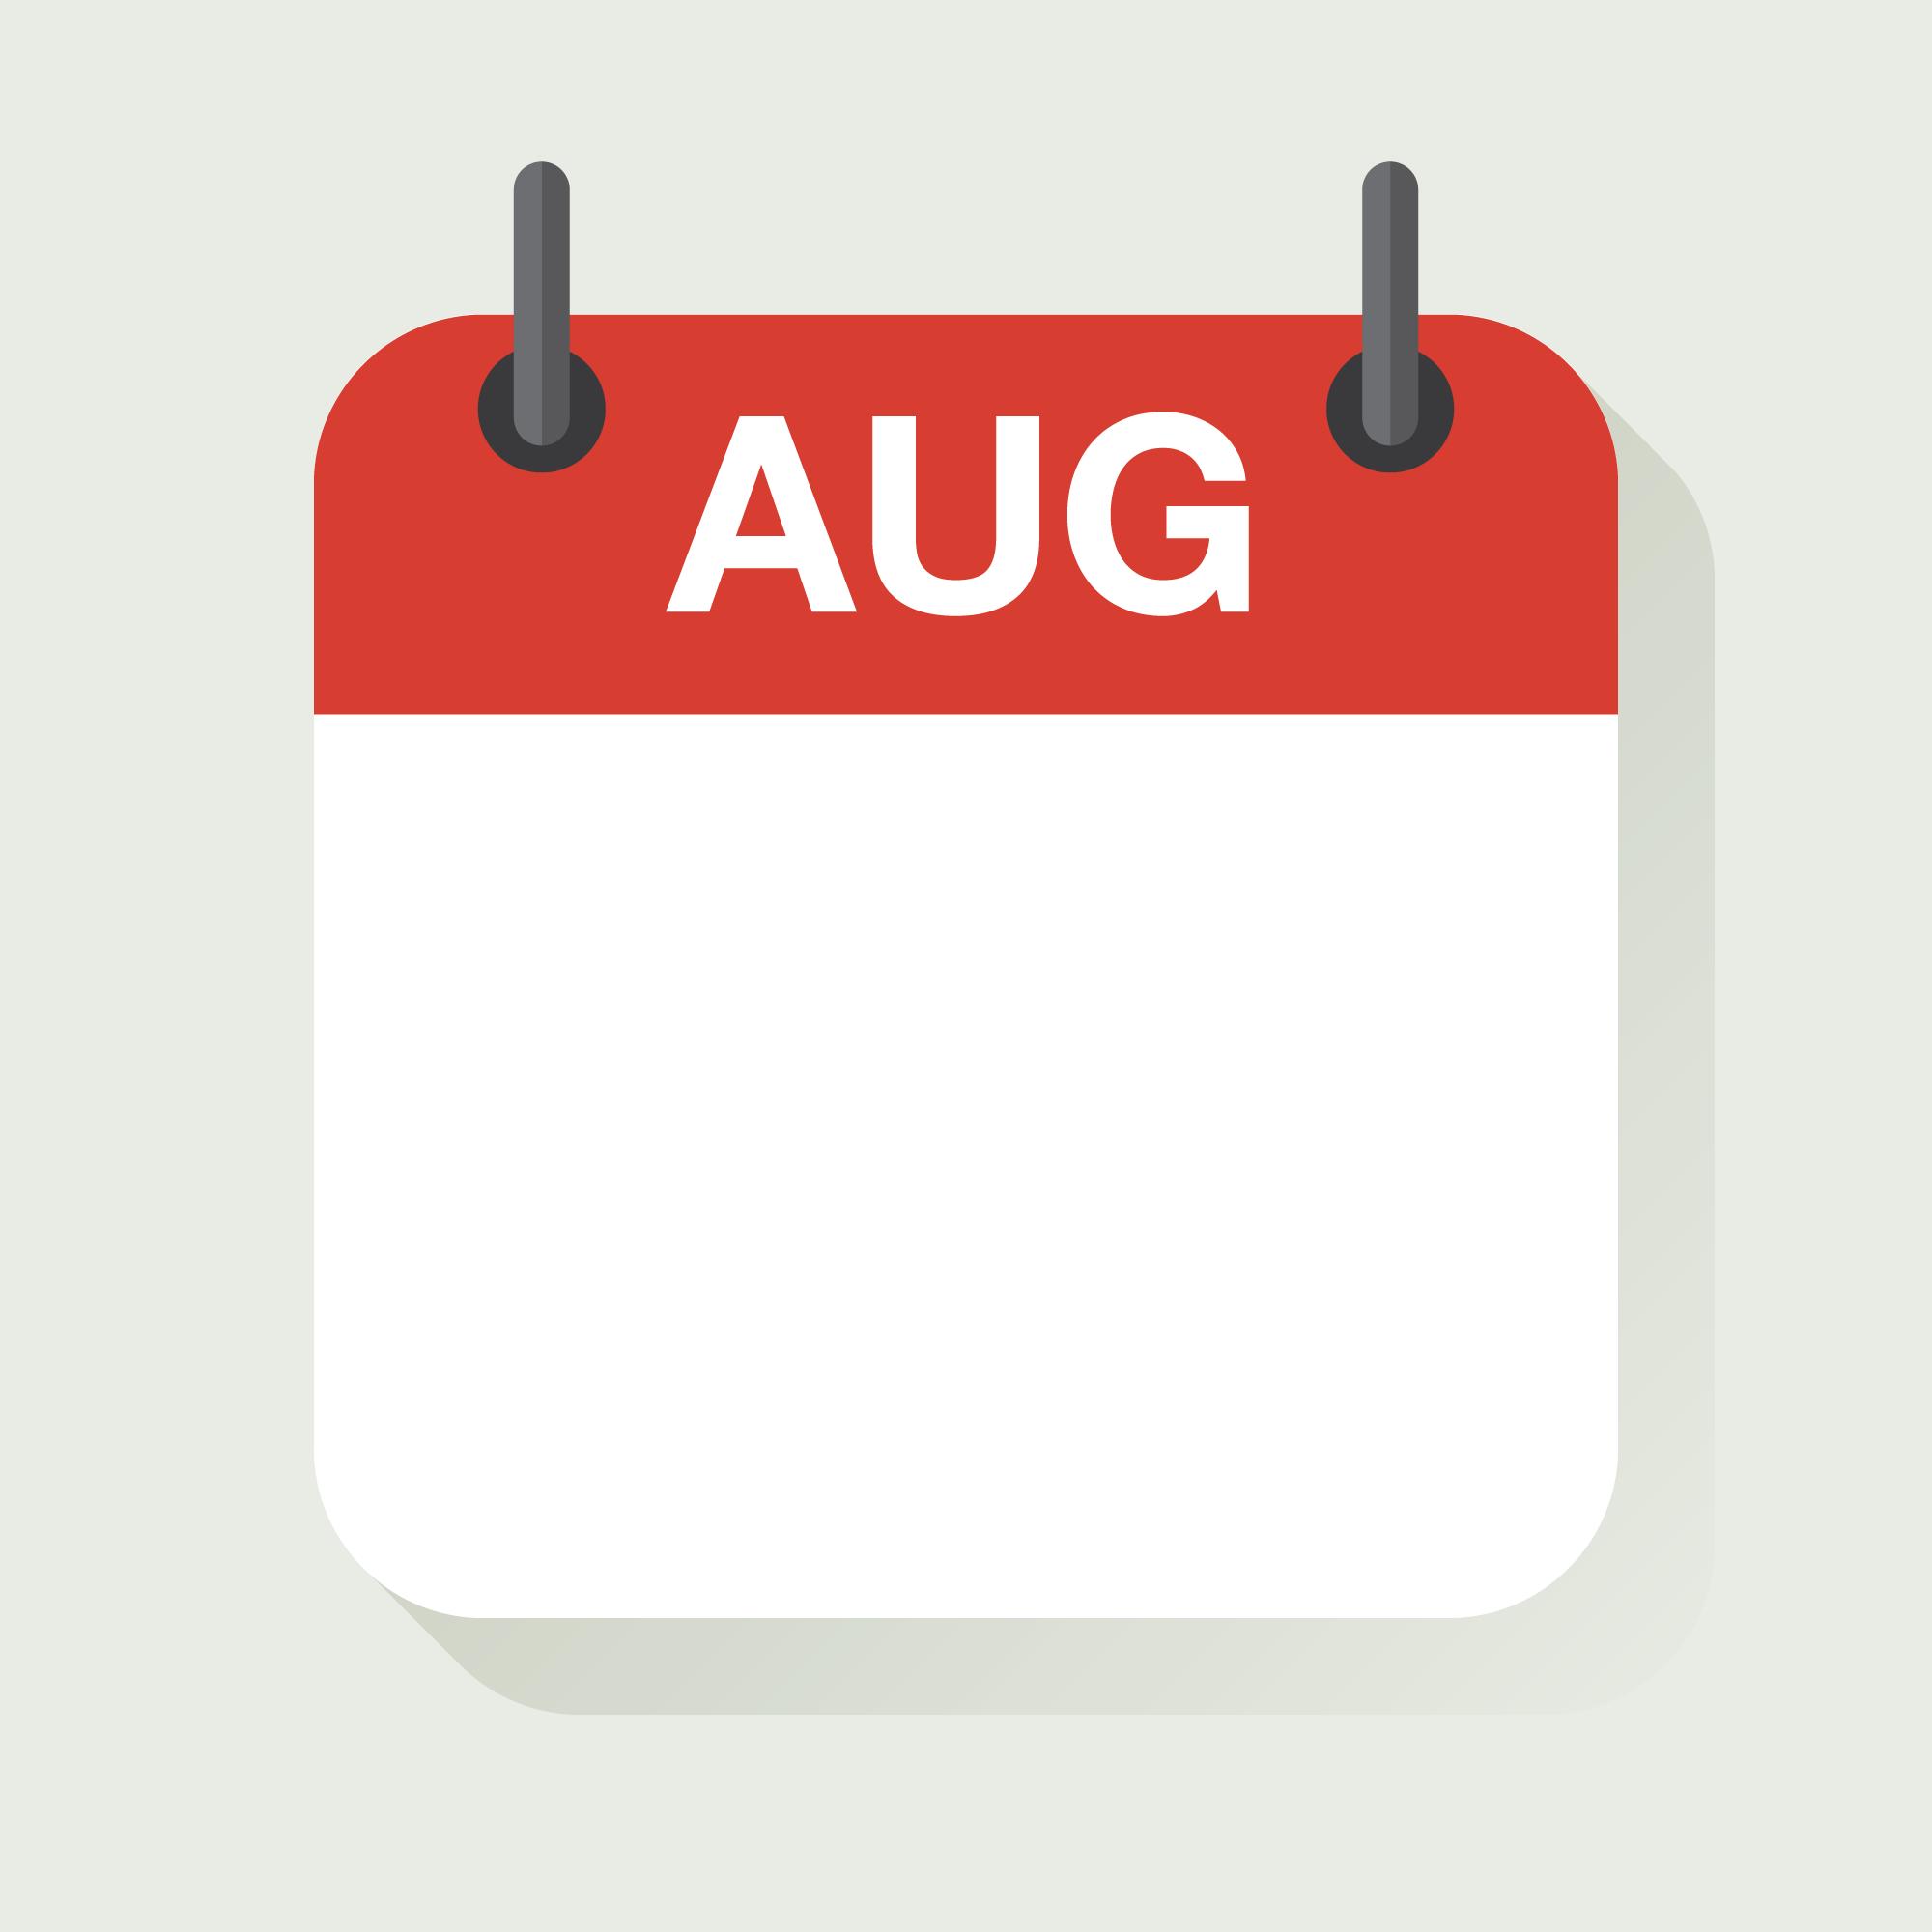 jason-b-graham-calendar-icon-august-featured-image-d53c31